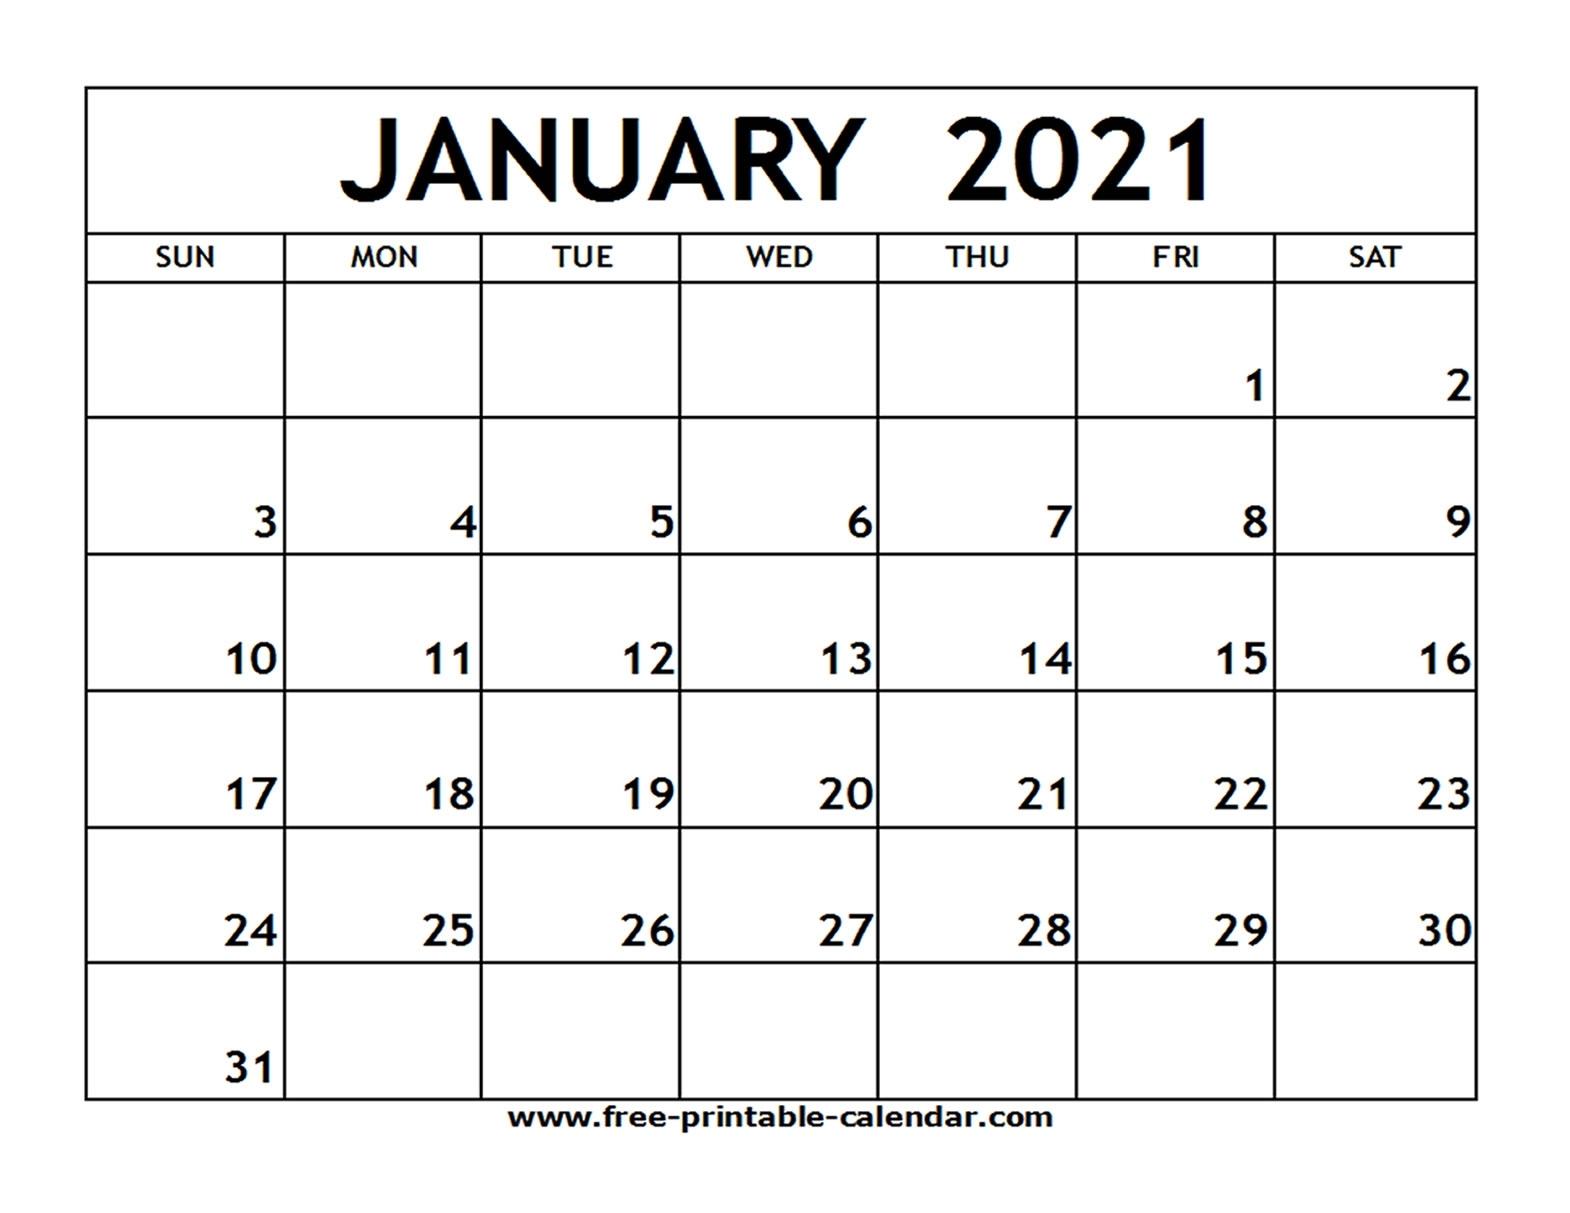 January 2021 Printable Calendar - Free-Printable-Calendar